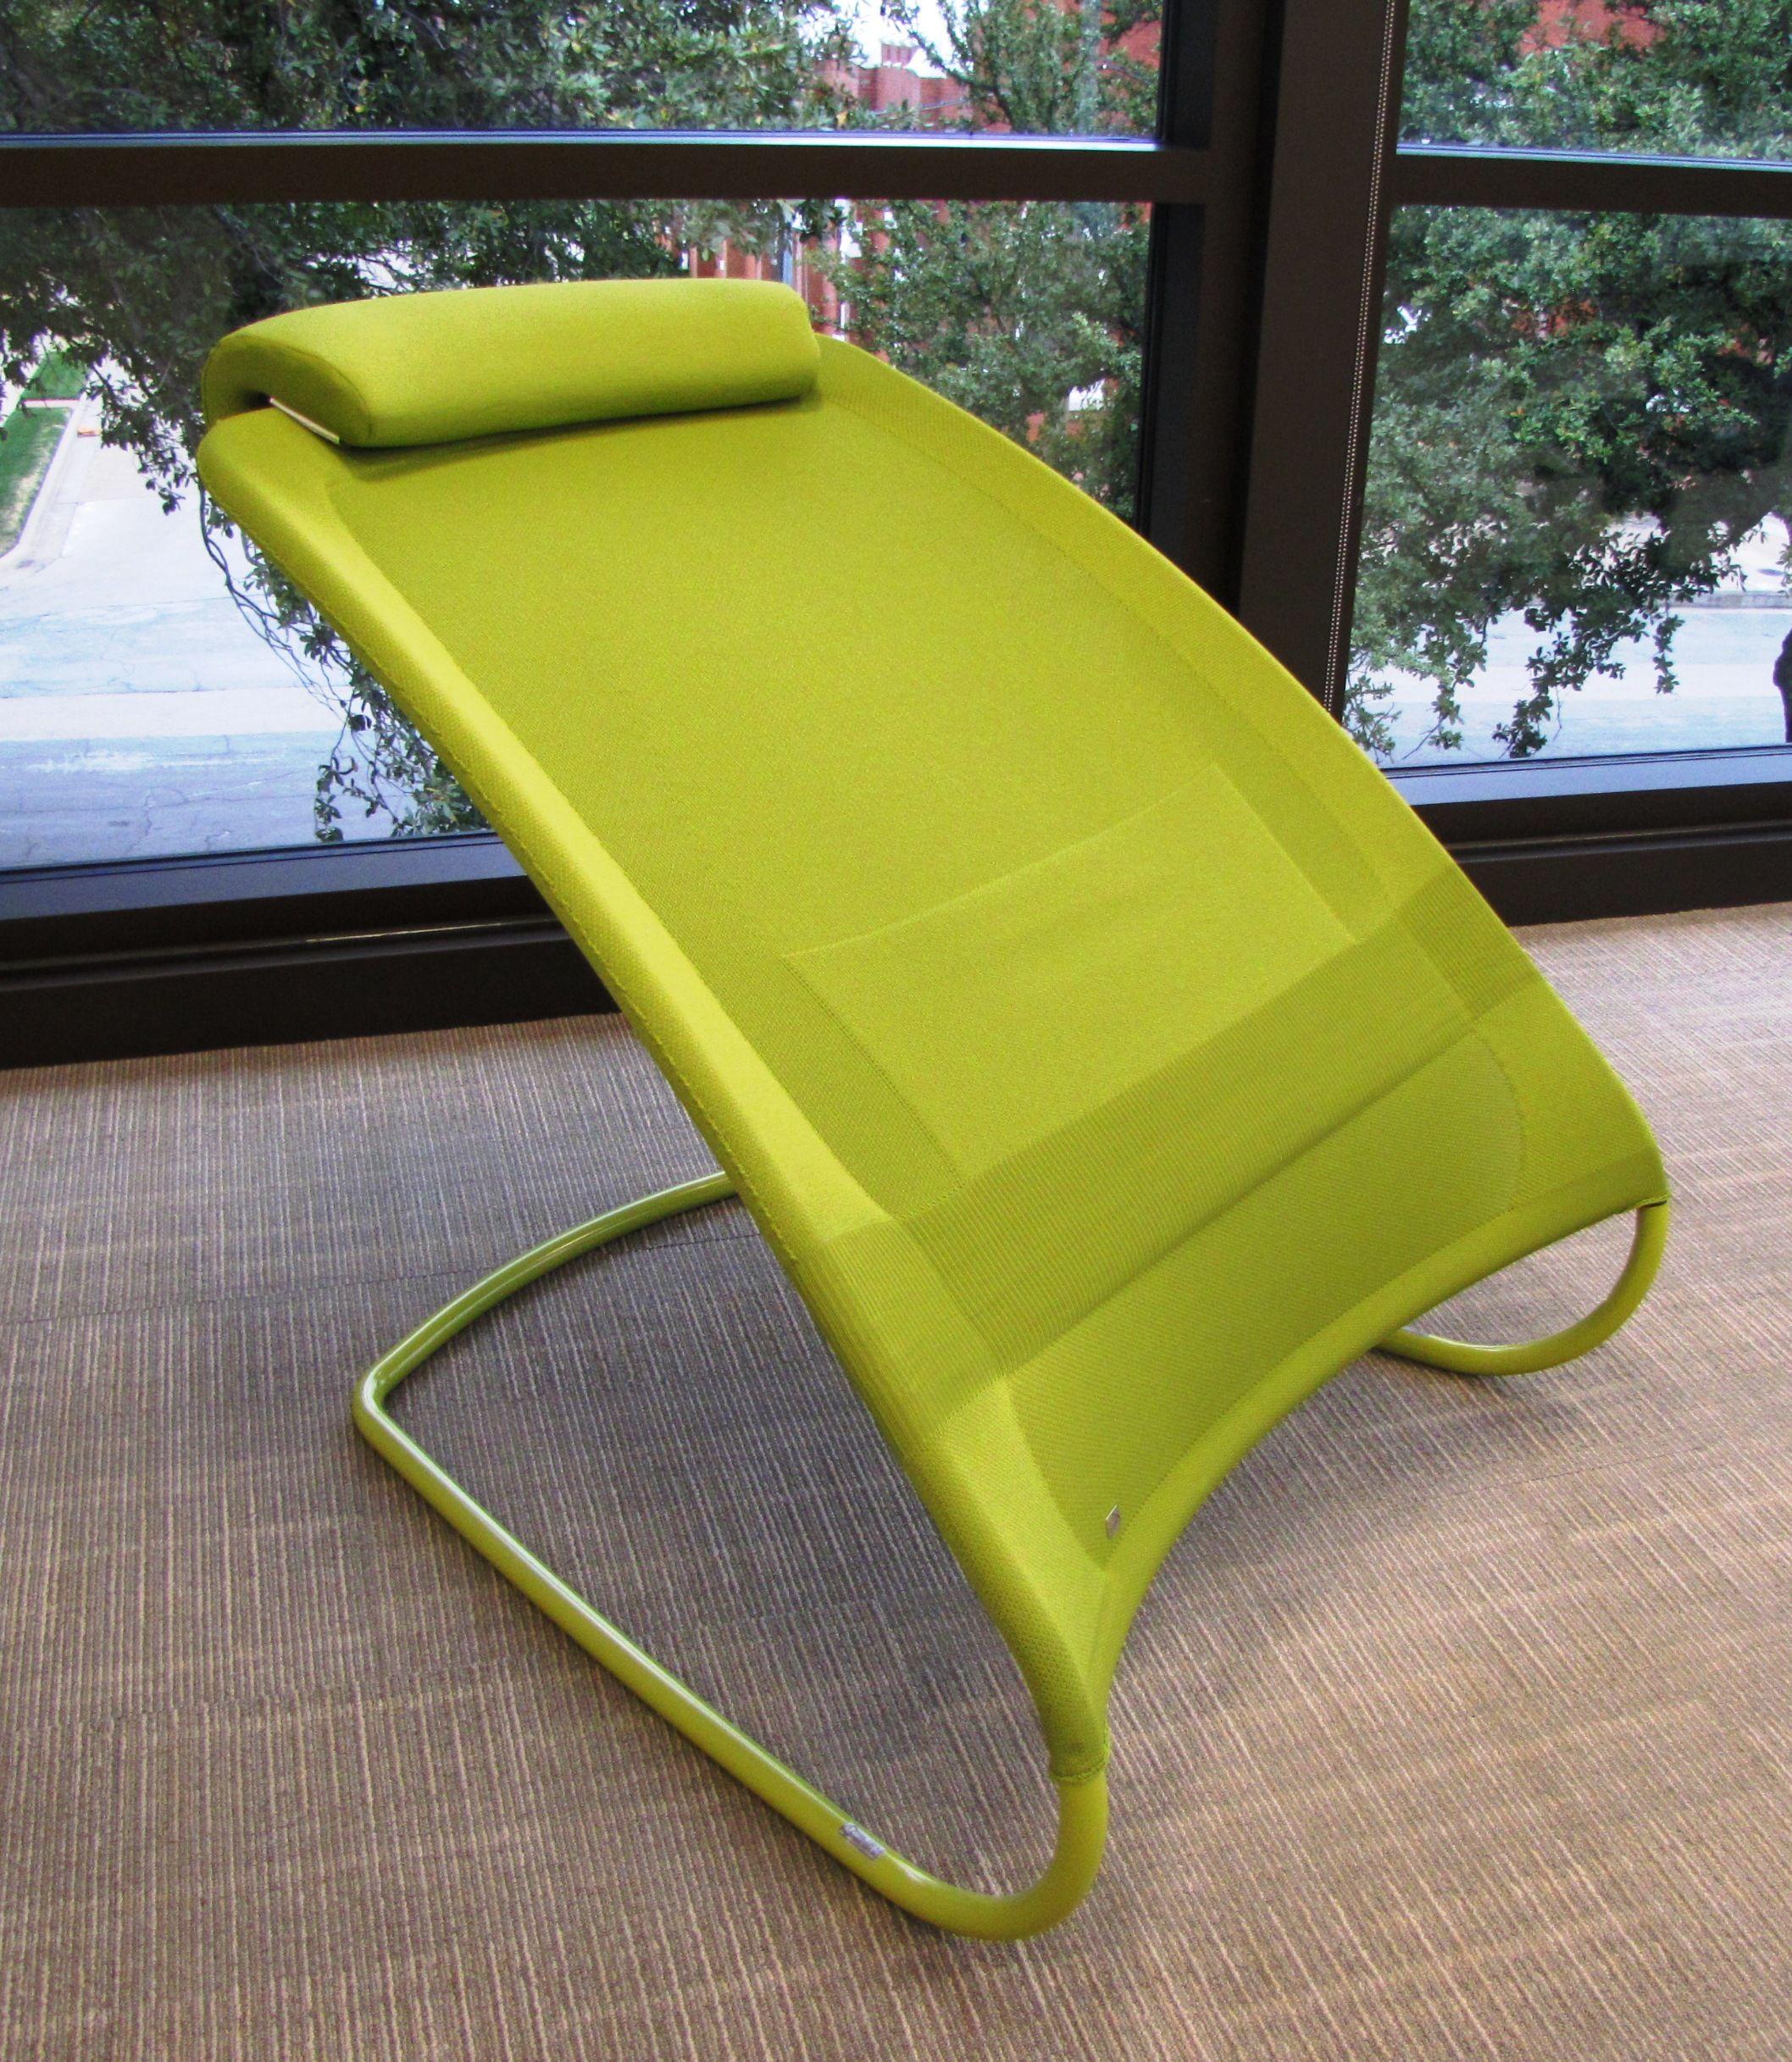 Kimball Bedroom Furniture Kimball Fit Chair 2014 Cherish The Children Pinterest Fit